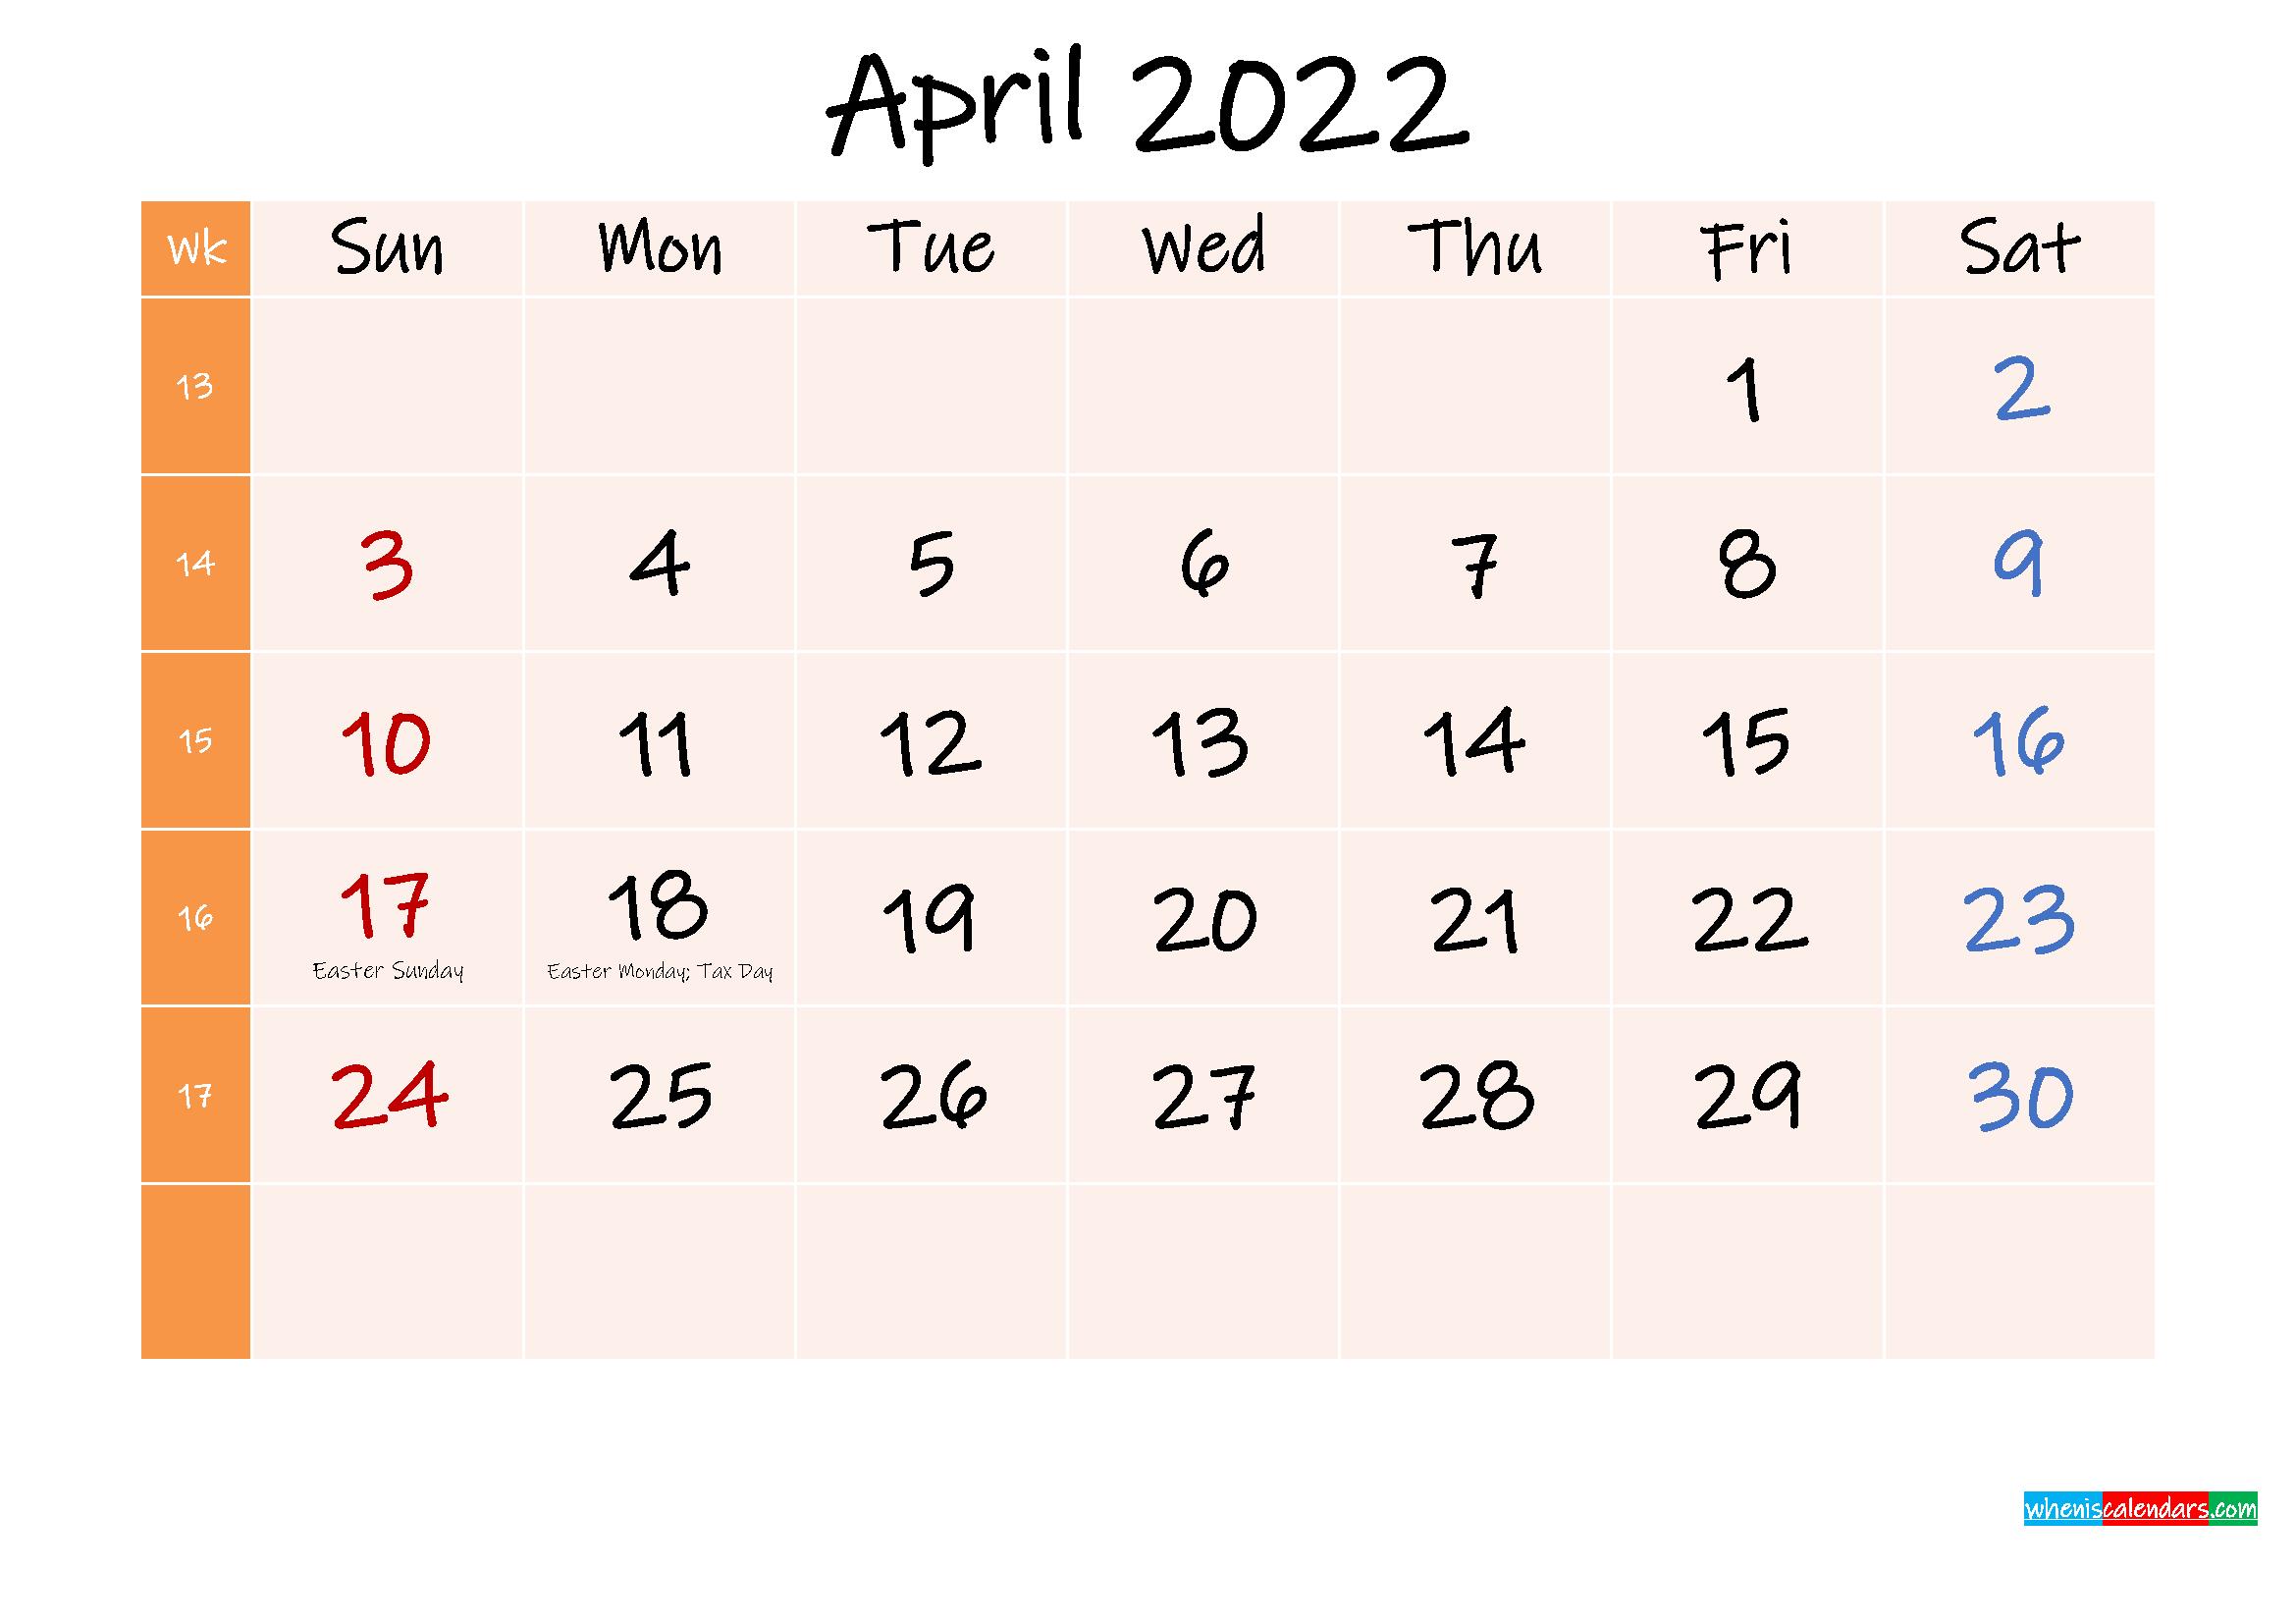 Free Printable April 2022 Calendar with Holidays